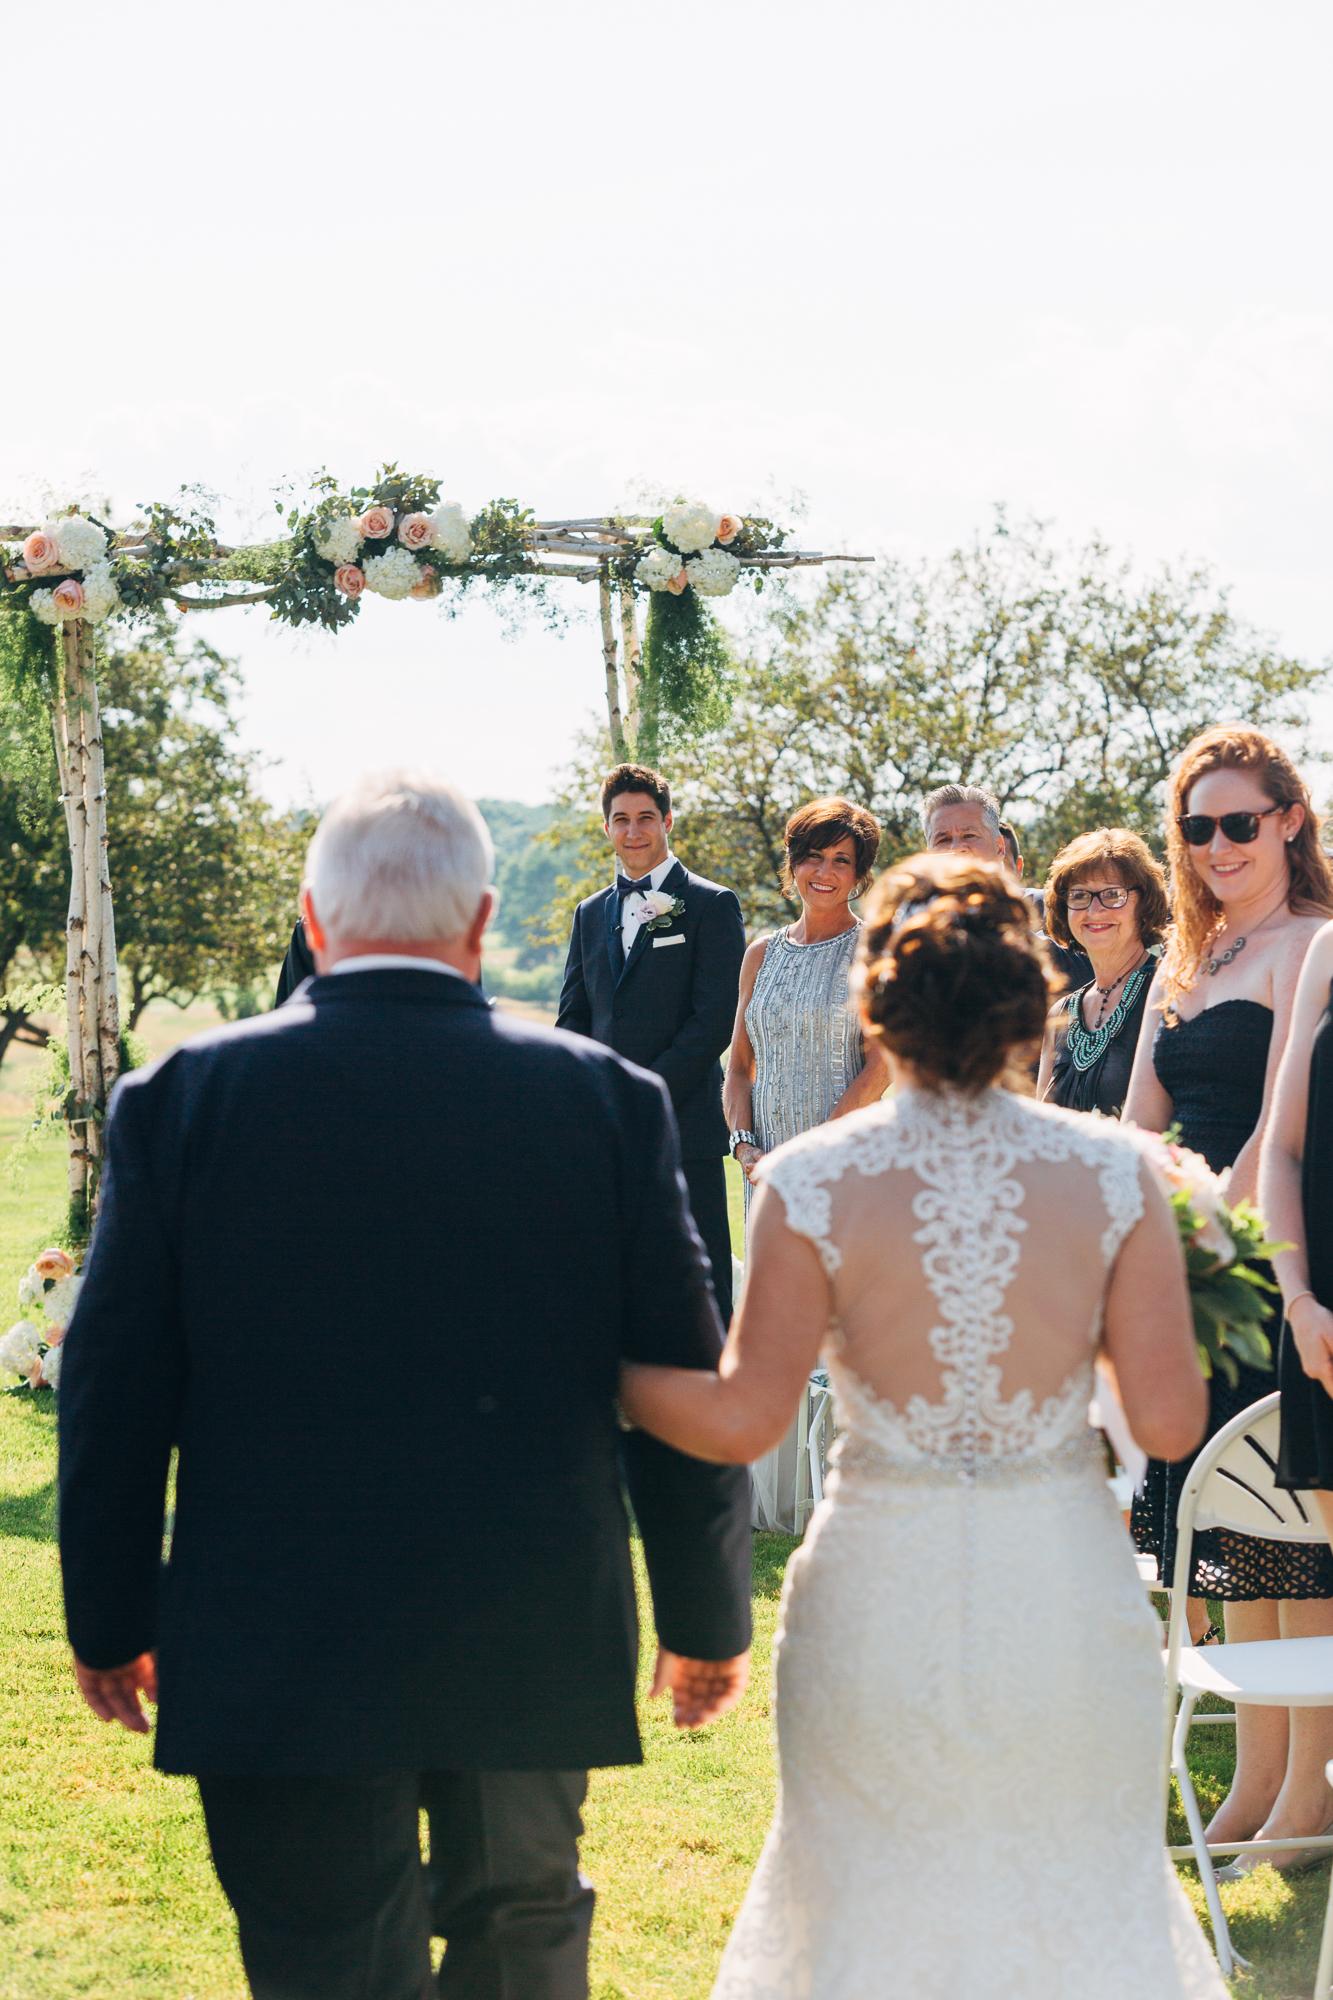 scranton-wedding-photography-zak-zavada-2016.06-rebeccaIan-1236.jpg